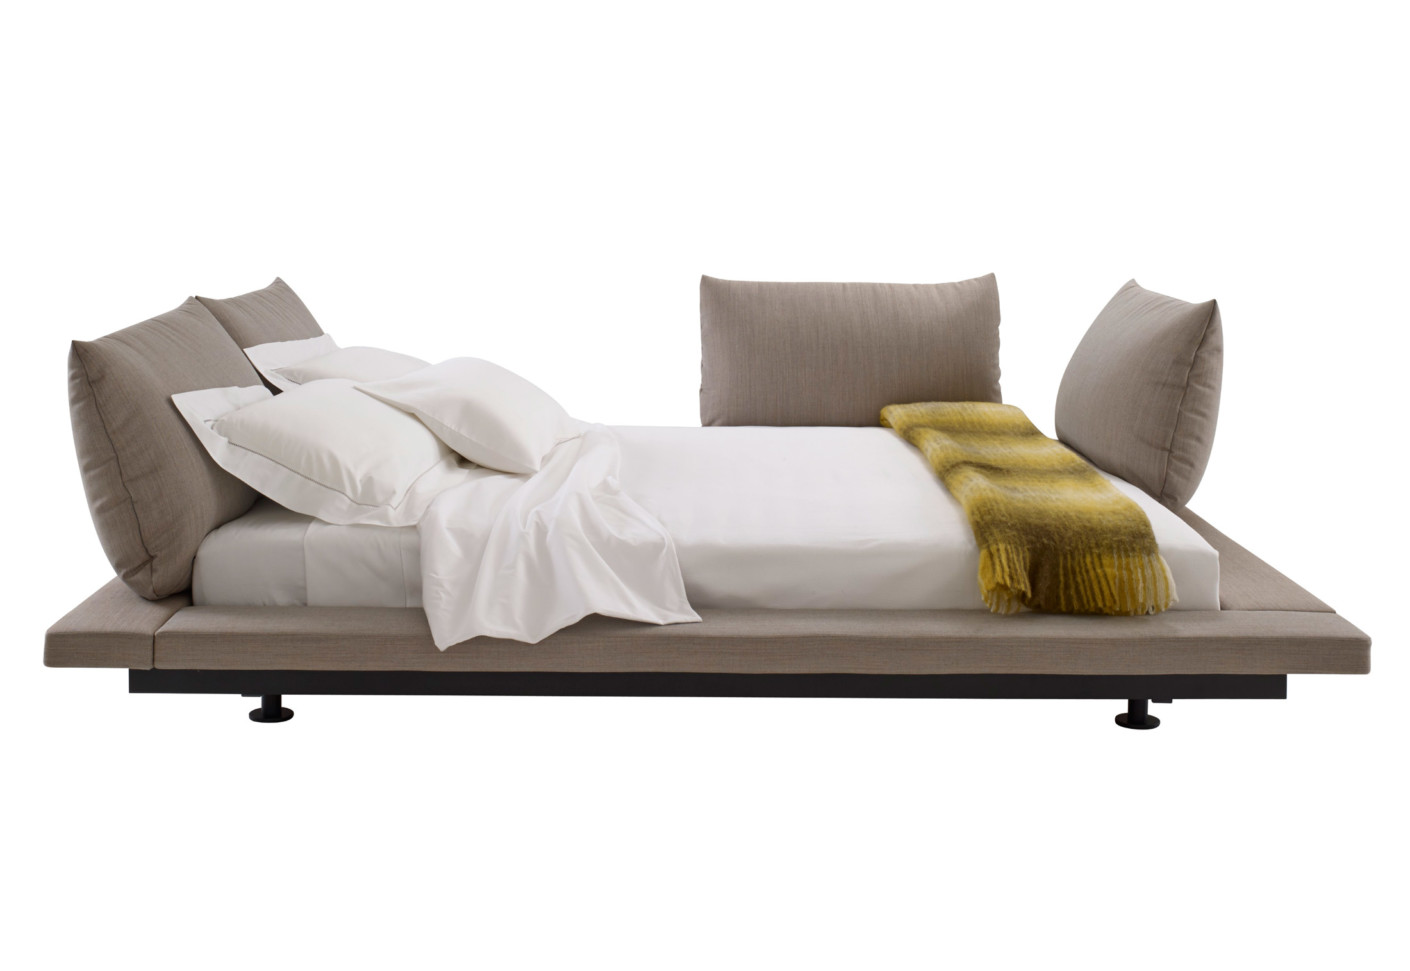 peter maly bett 2 von ligne roset stylepark. Black Bedroom Furniture Sets. Home Design Ideas